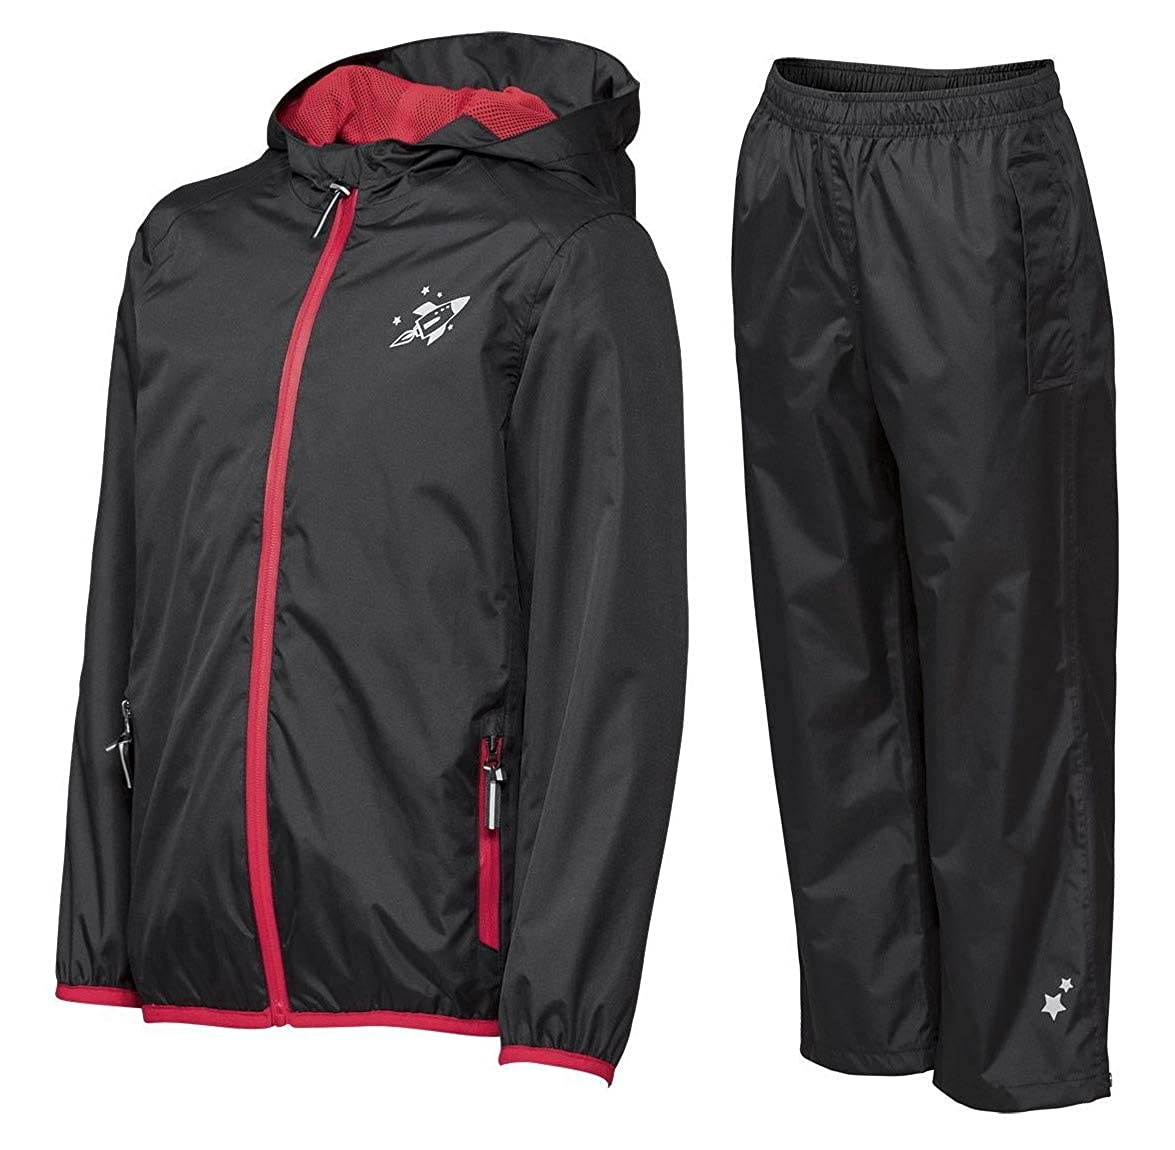 Crivit Jungen Regenanzug 2-teilig Regenjacke Regenhose Regenkombi Matschanzug Windjacke /Überhose